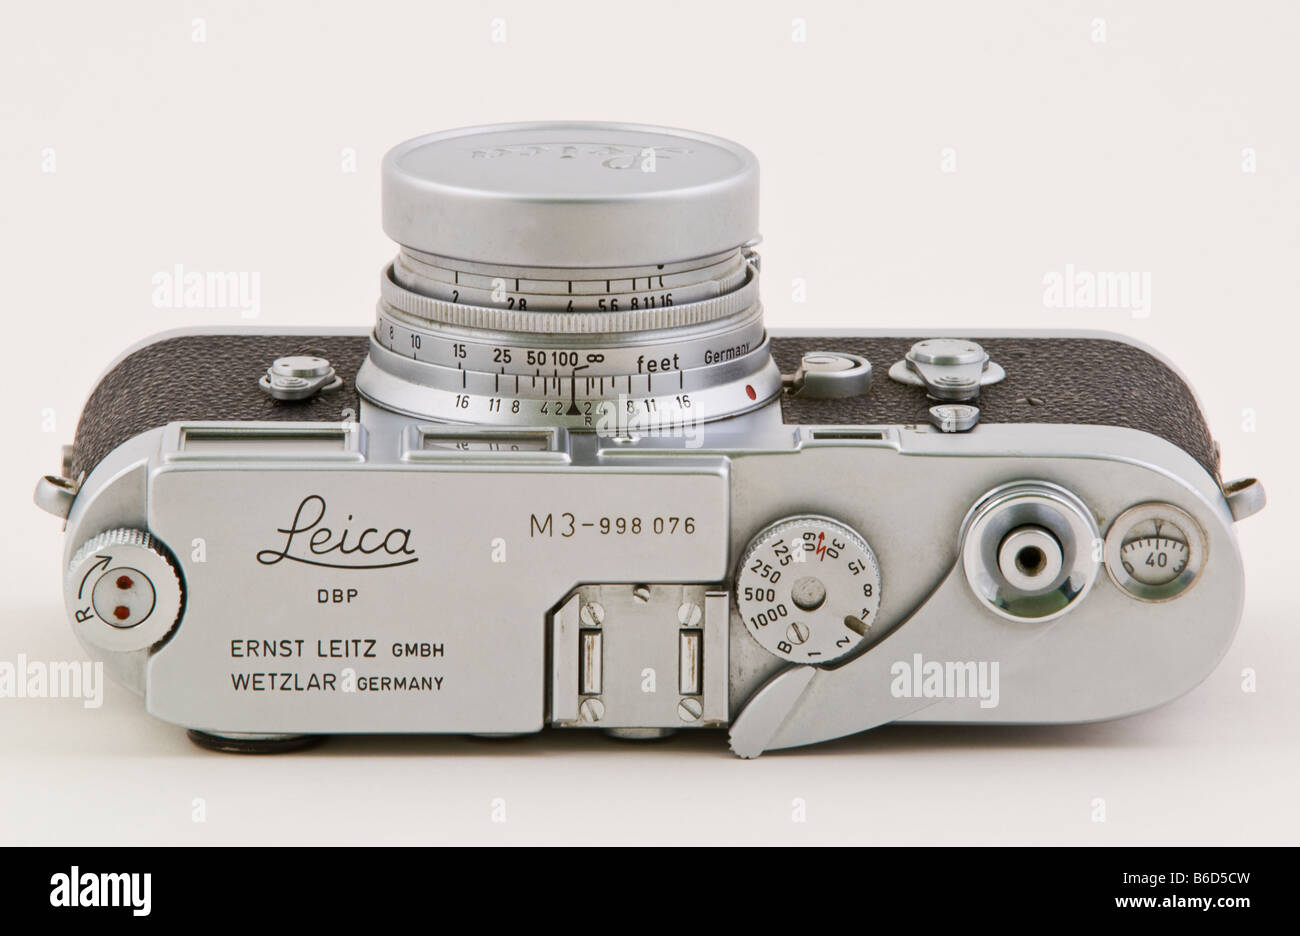 Leica Oder Zeiss Entfernungsmesser : Leica m stockfotos bilder alamy